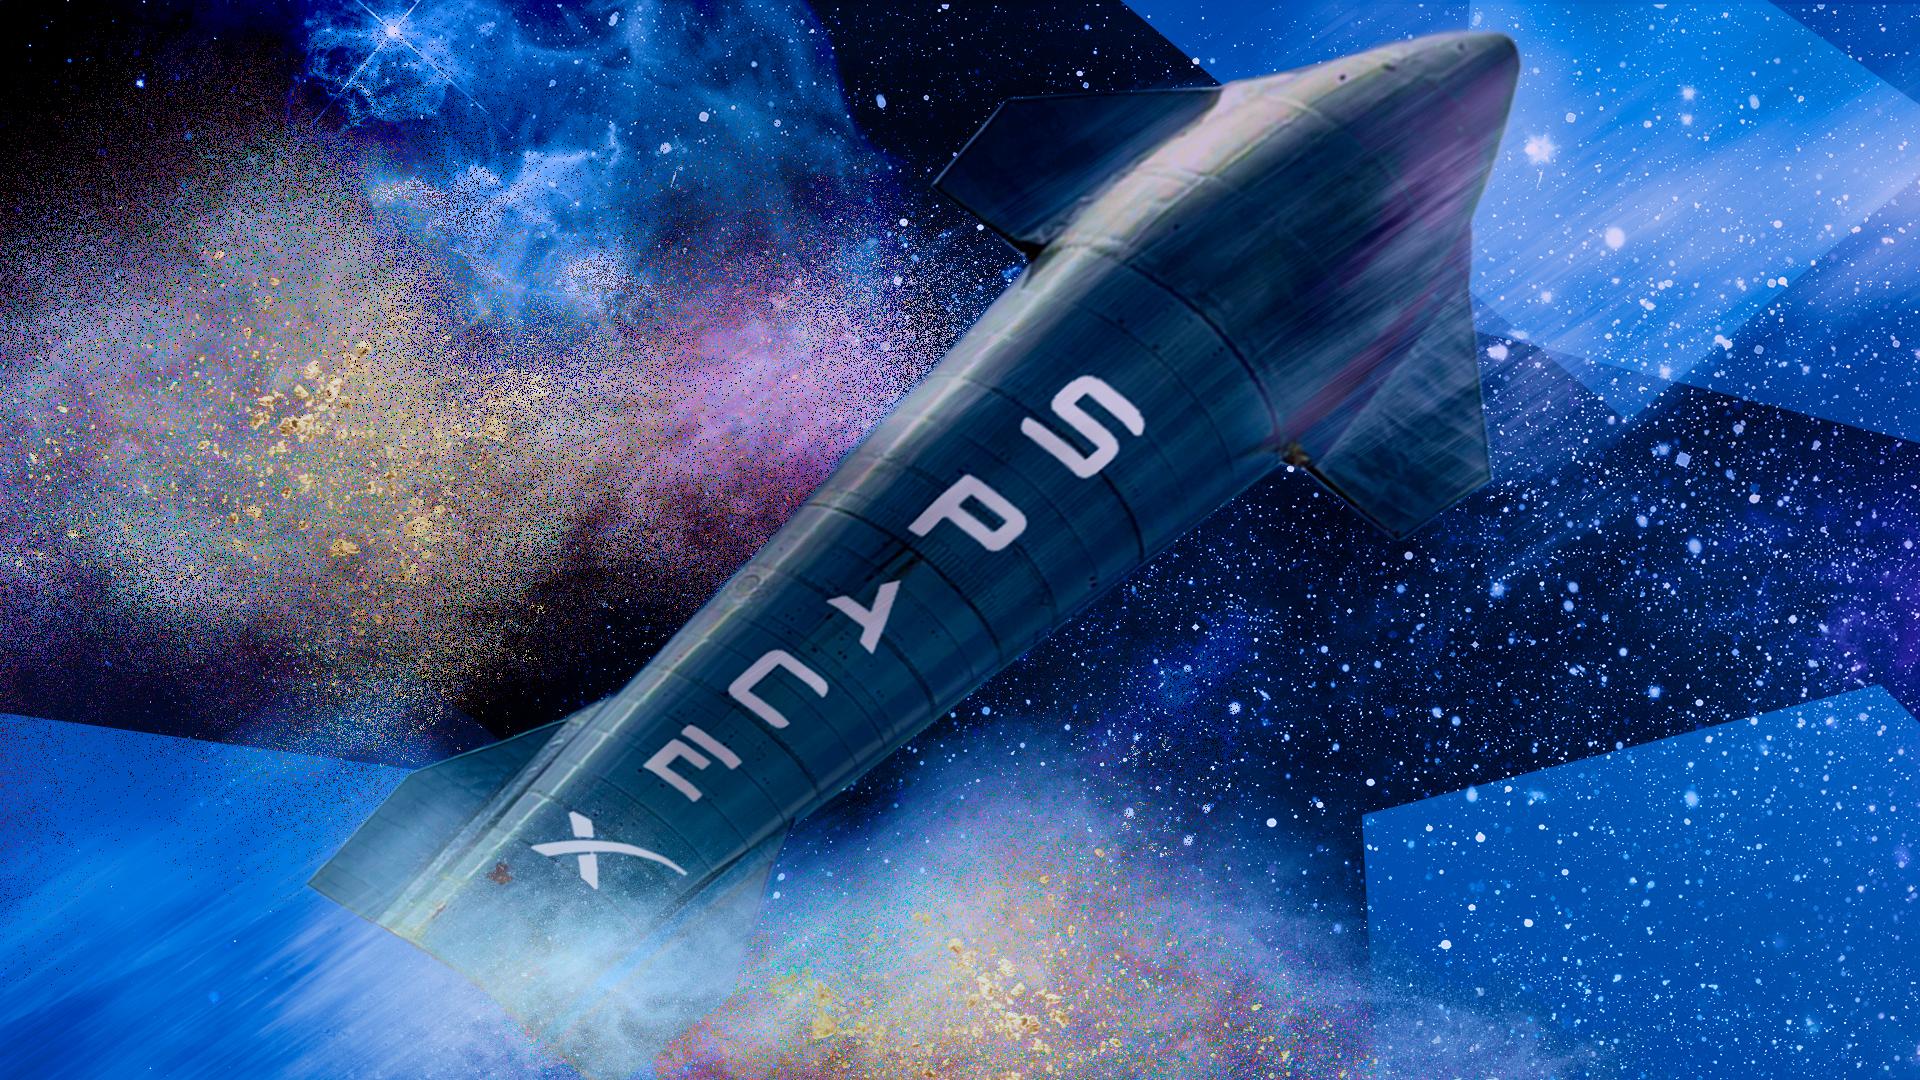 Weltraum, Raumfahrt, Weltall, Spacex, Rakete, Spaceship, Starship